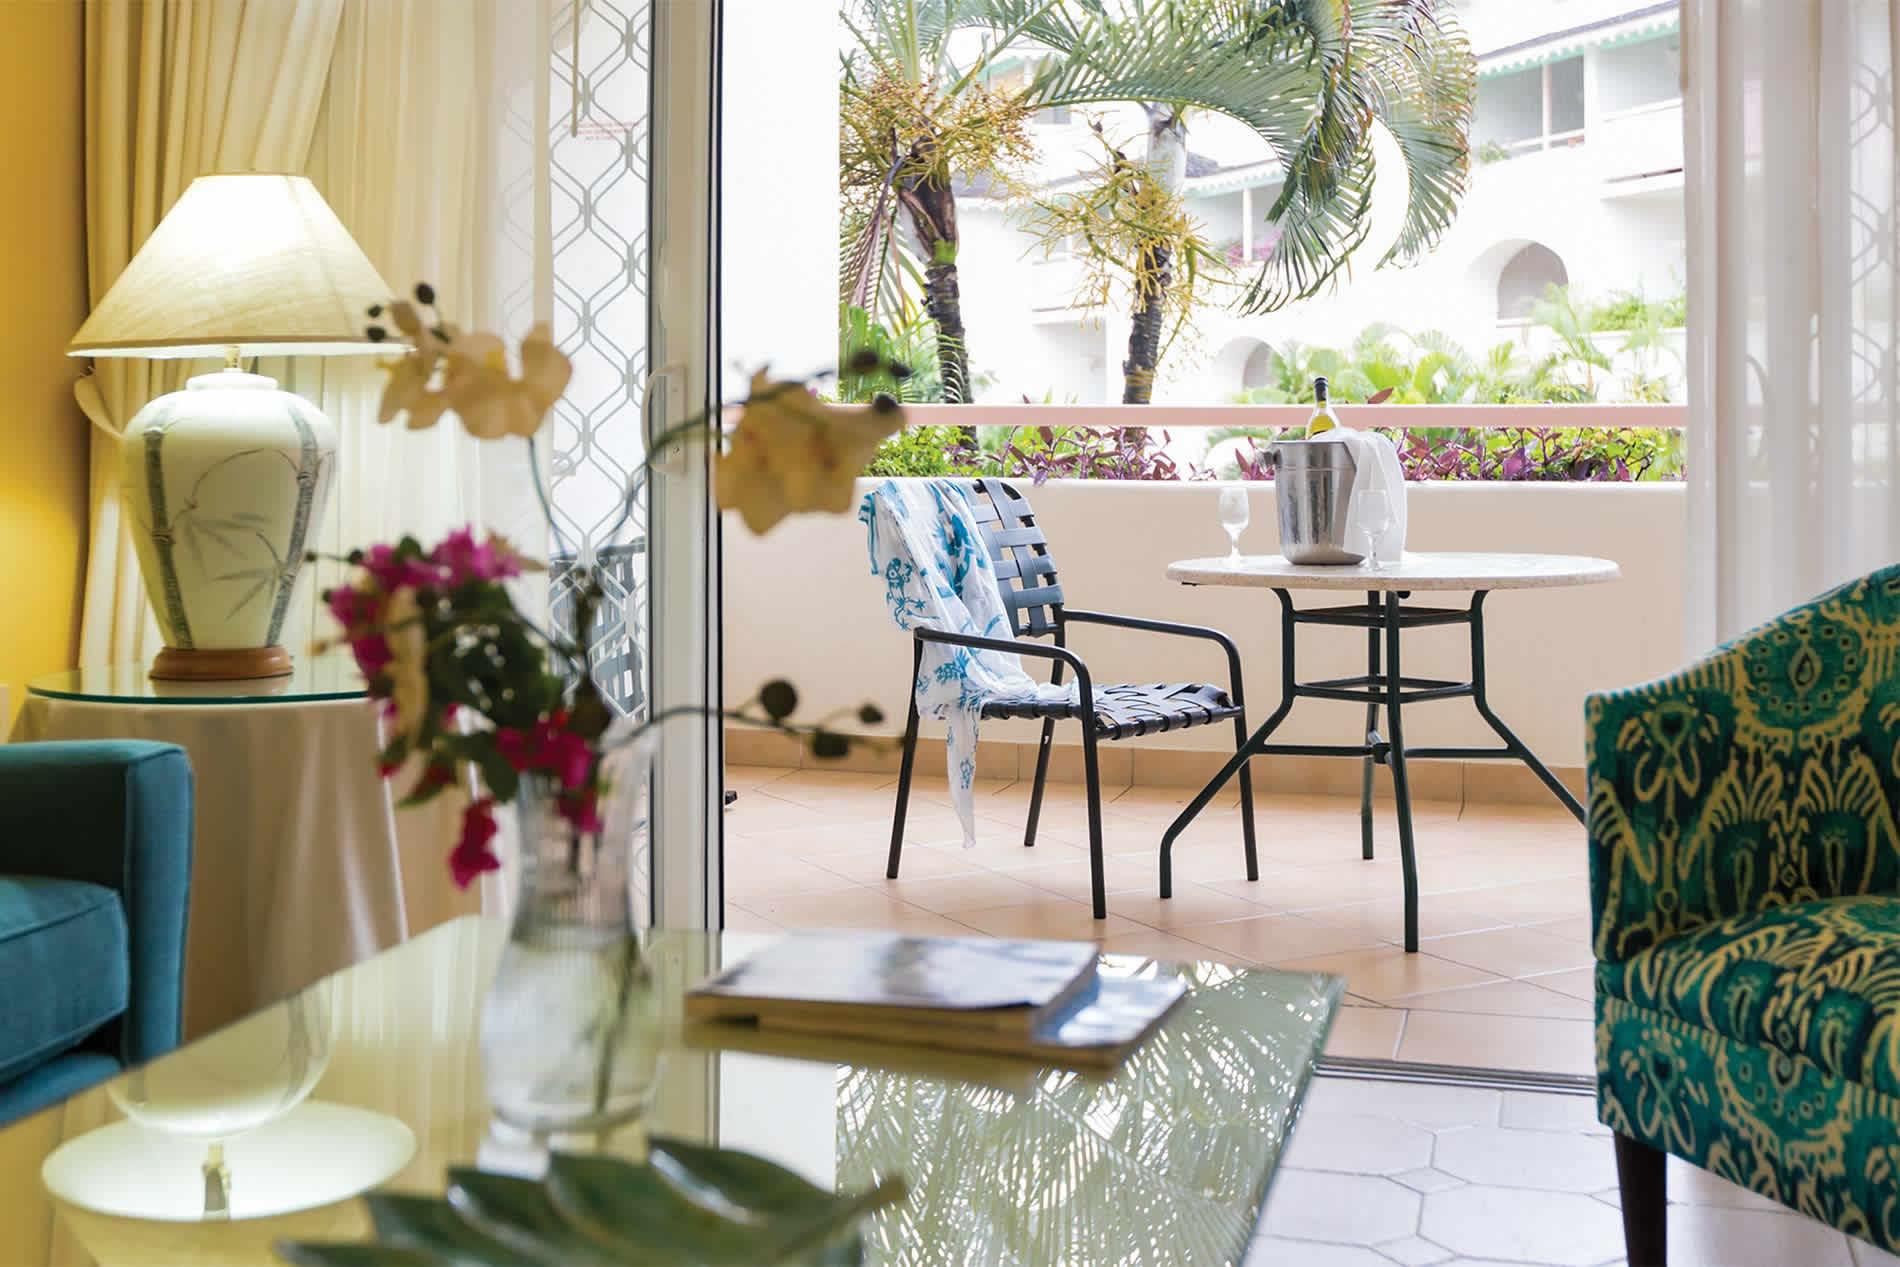 Apartment Bougainvillea Junior Suite in Bougainvillea Beach Resort - sleeps 2 people